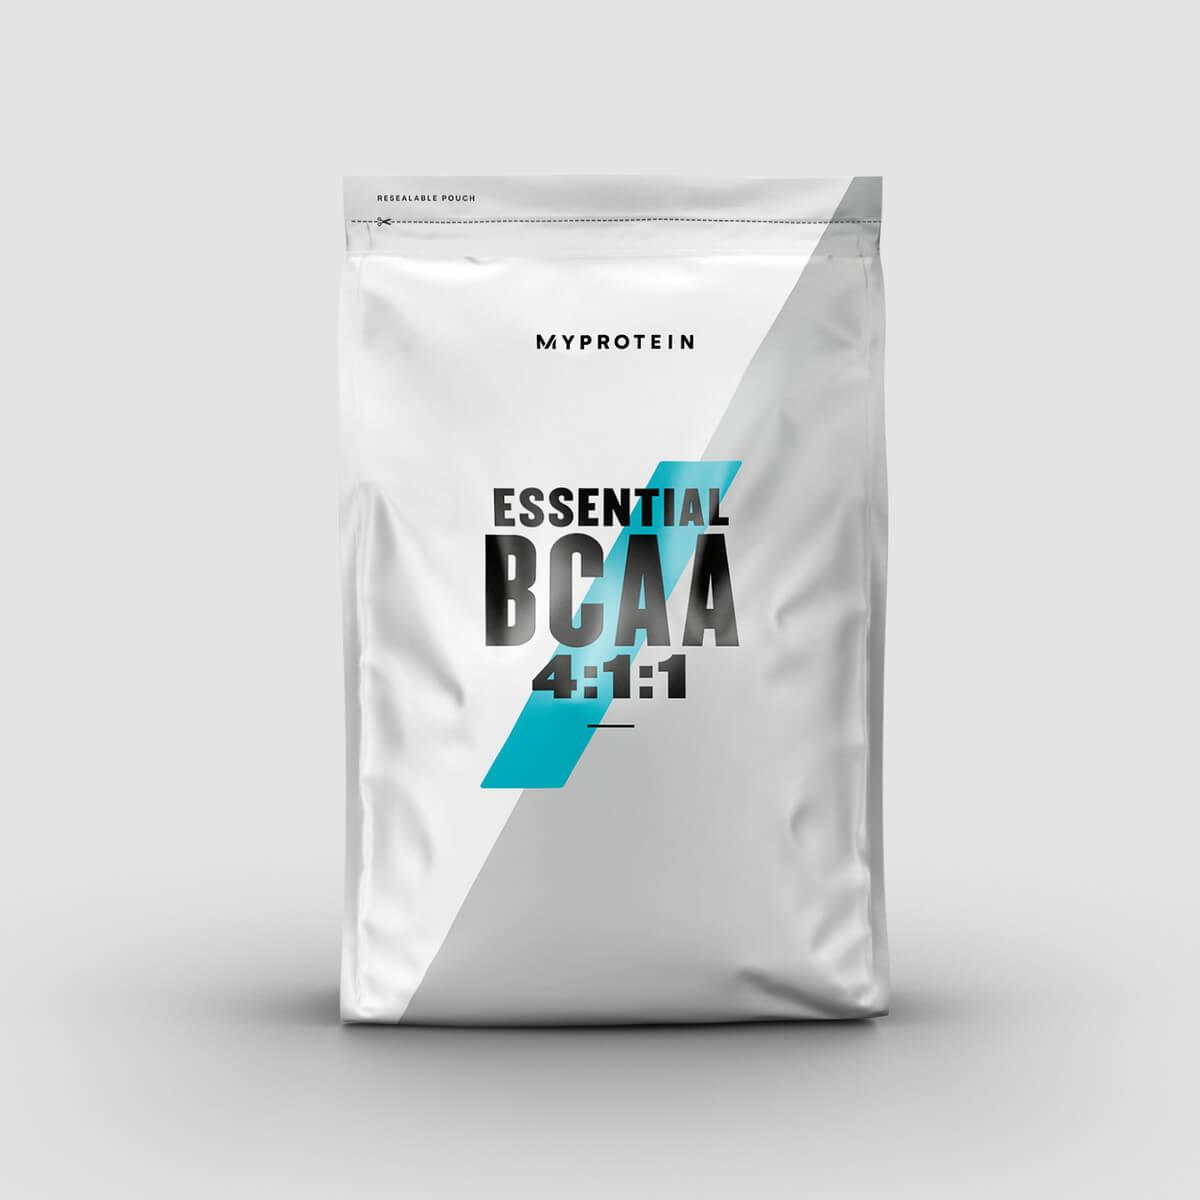 Myprotein BCAA 4:1:1 - 1kg - Sans arôme ajouté